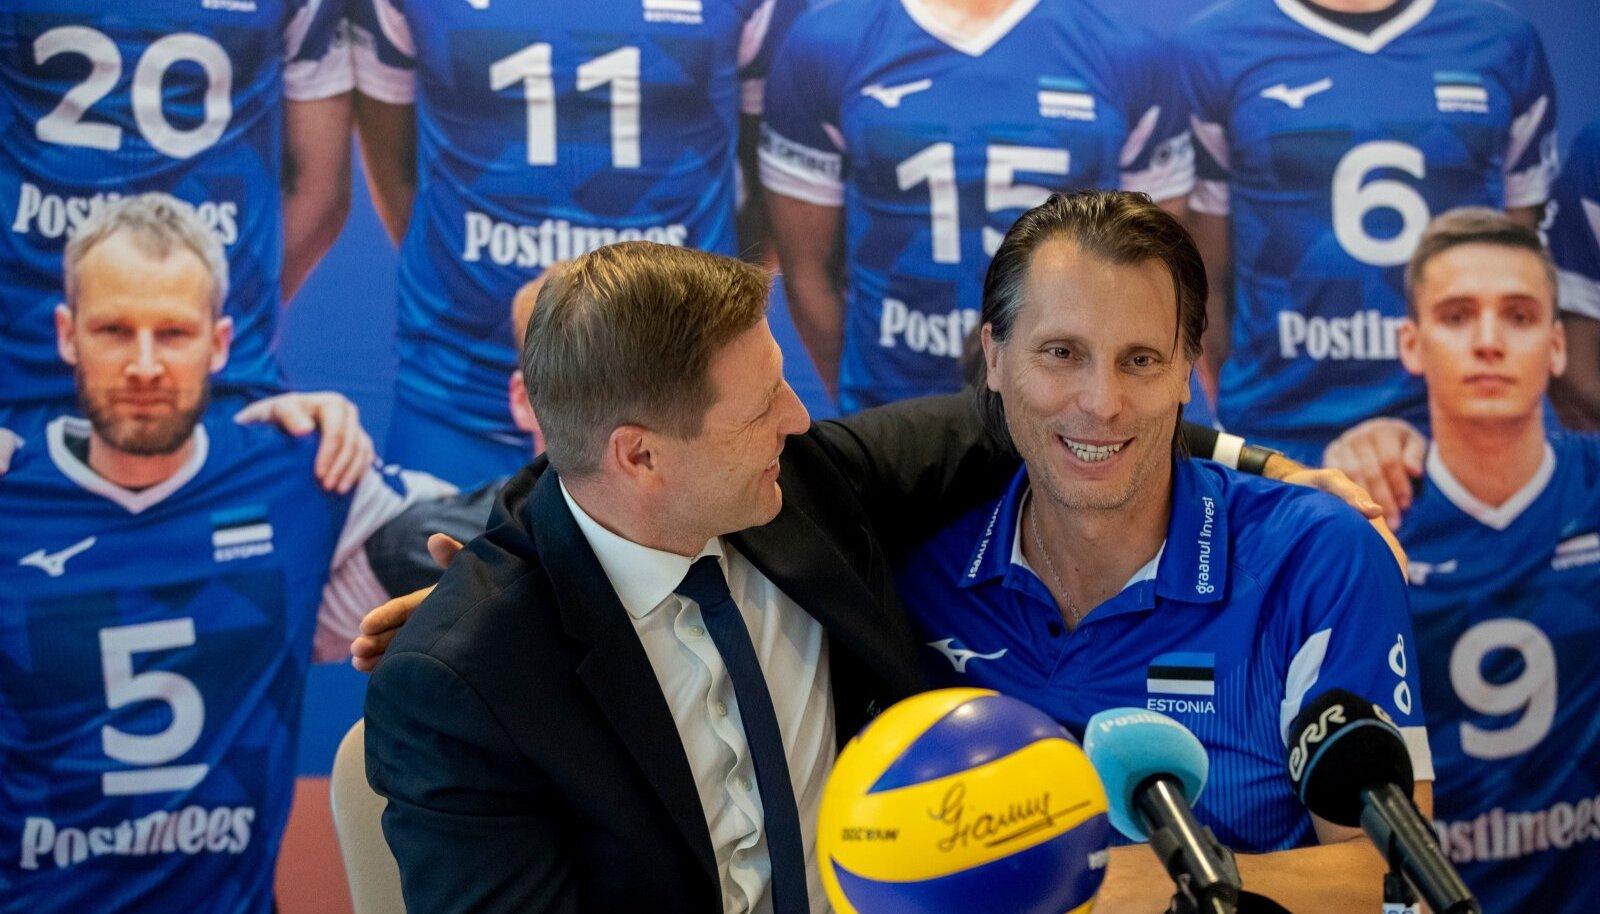 Hanno Pevkur ja Gheorghe Cretu.